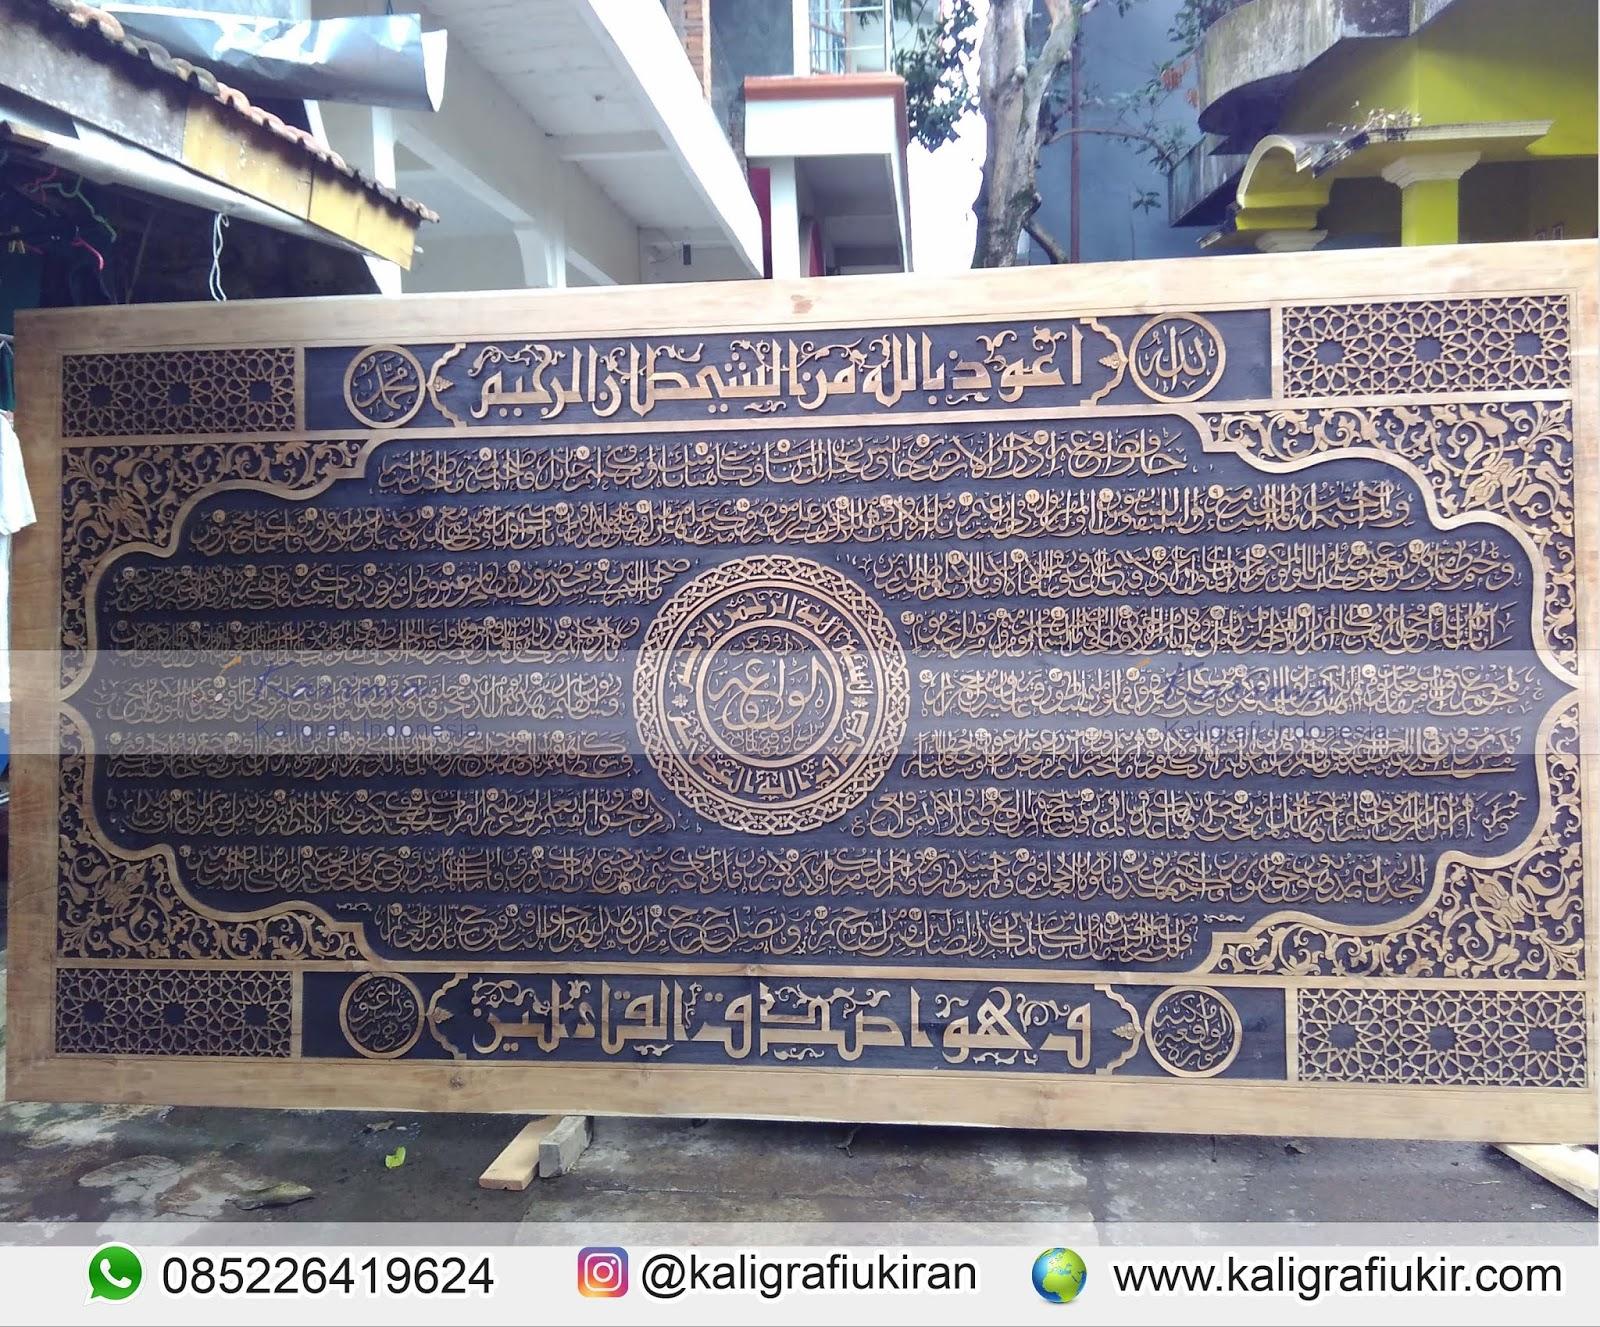 Kaligrafi Surat Al Waqiah Lengkap Ukiran Kaligrafi Ukiran